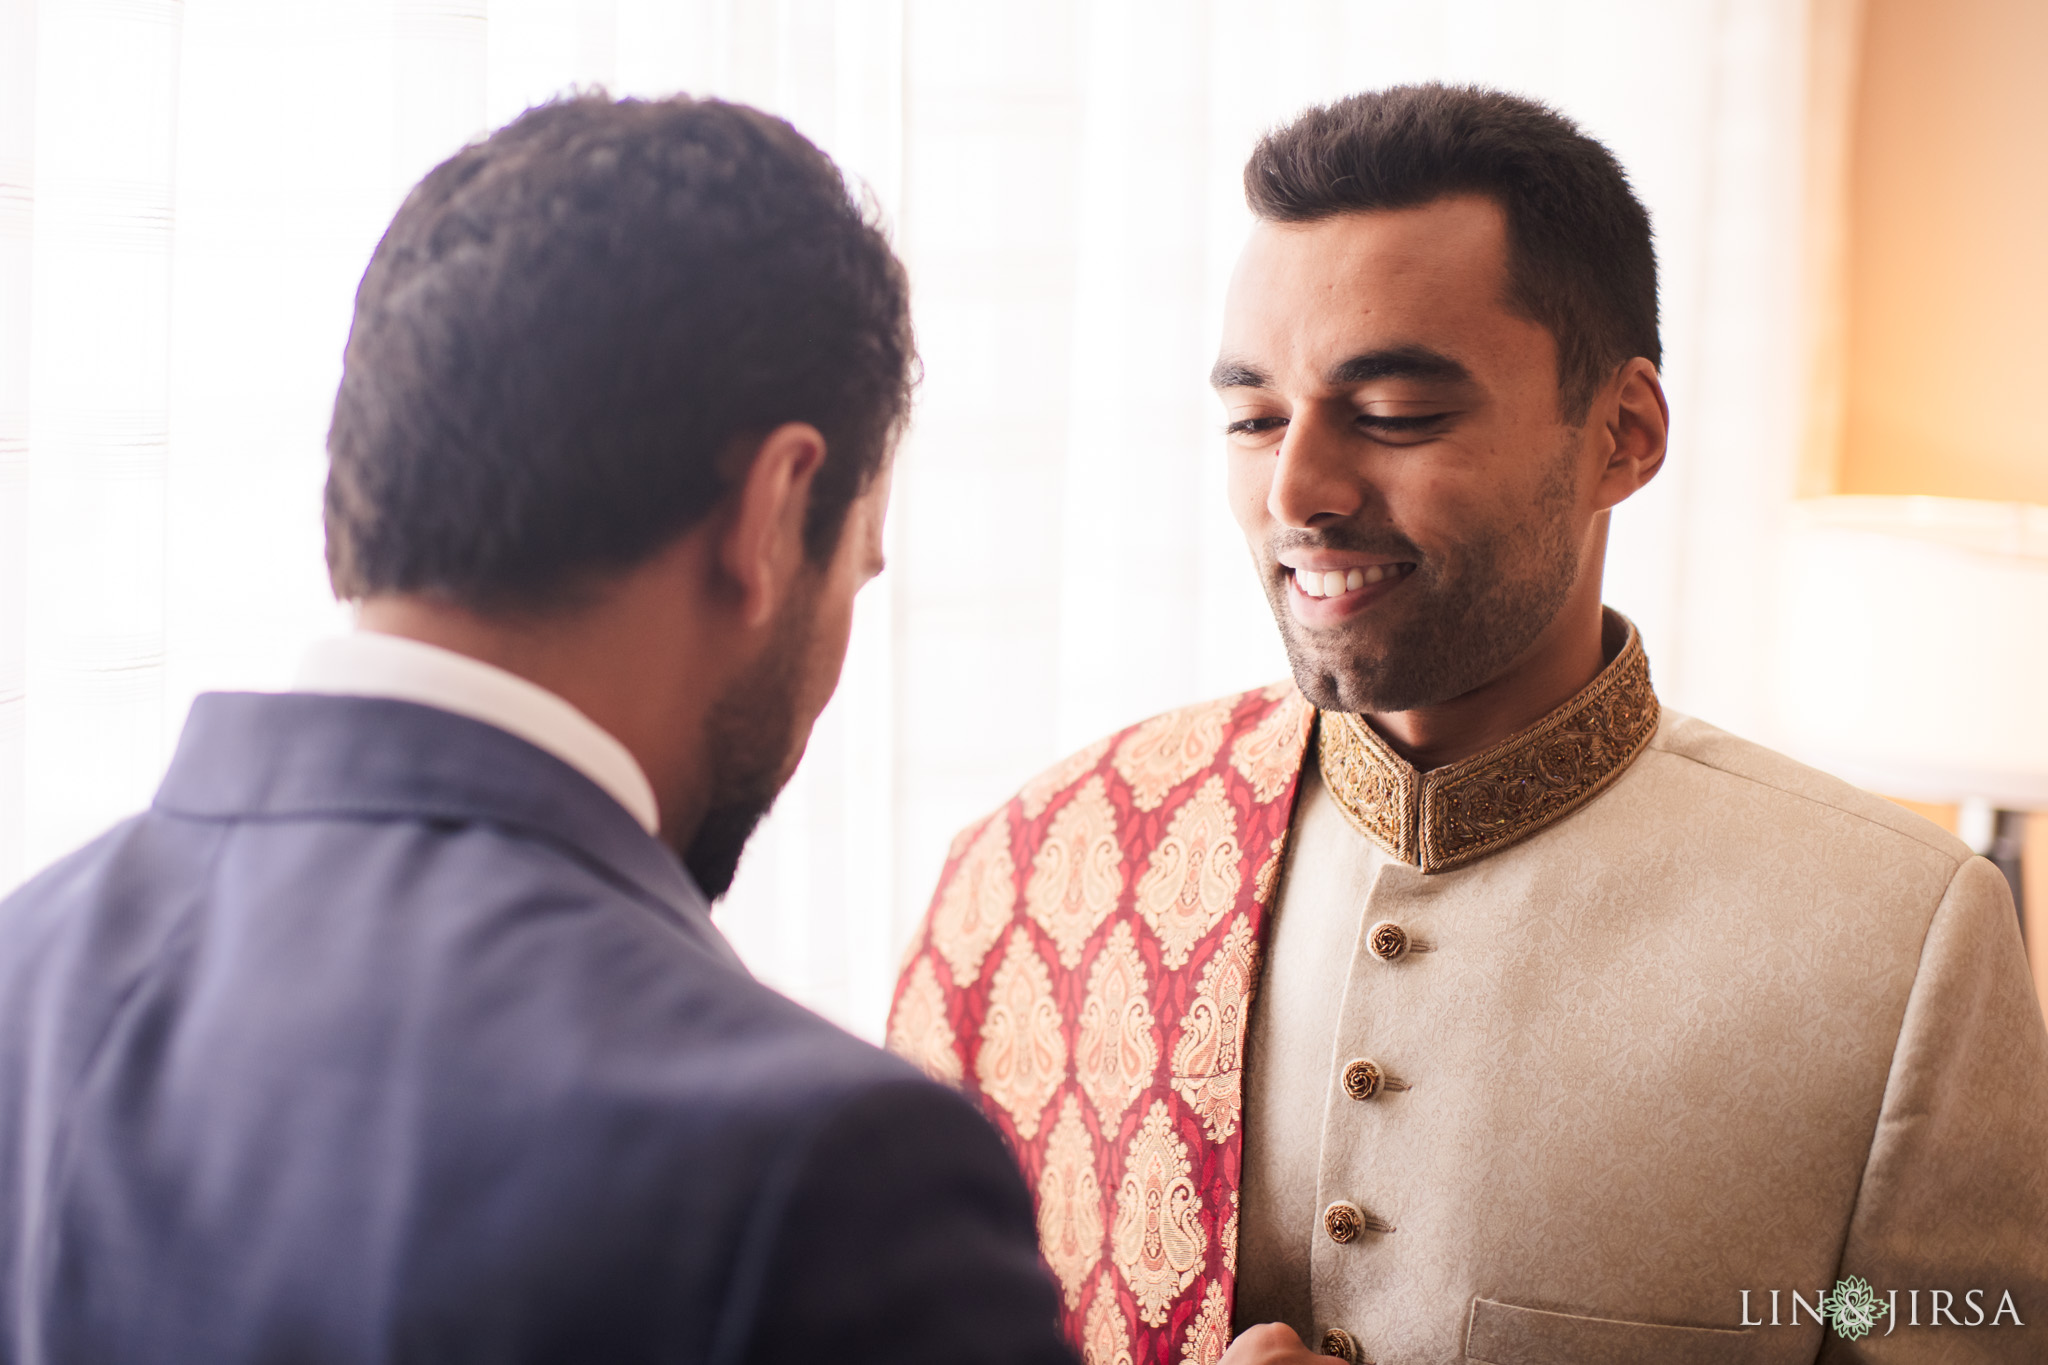 009 pasea hotel huntington beach pakistani muslim wedding photography